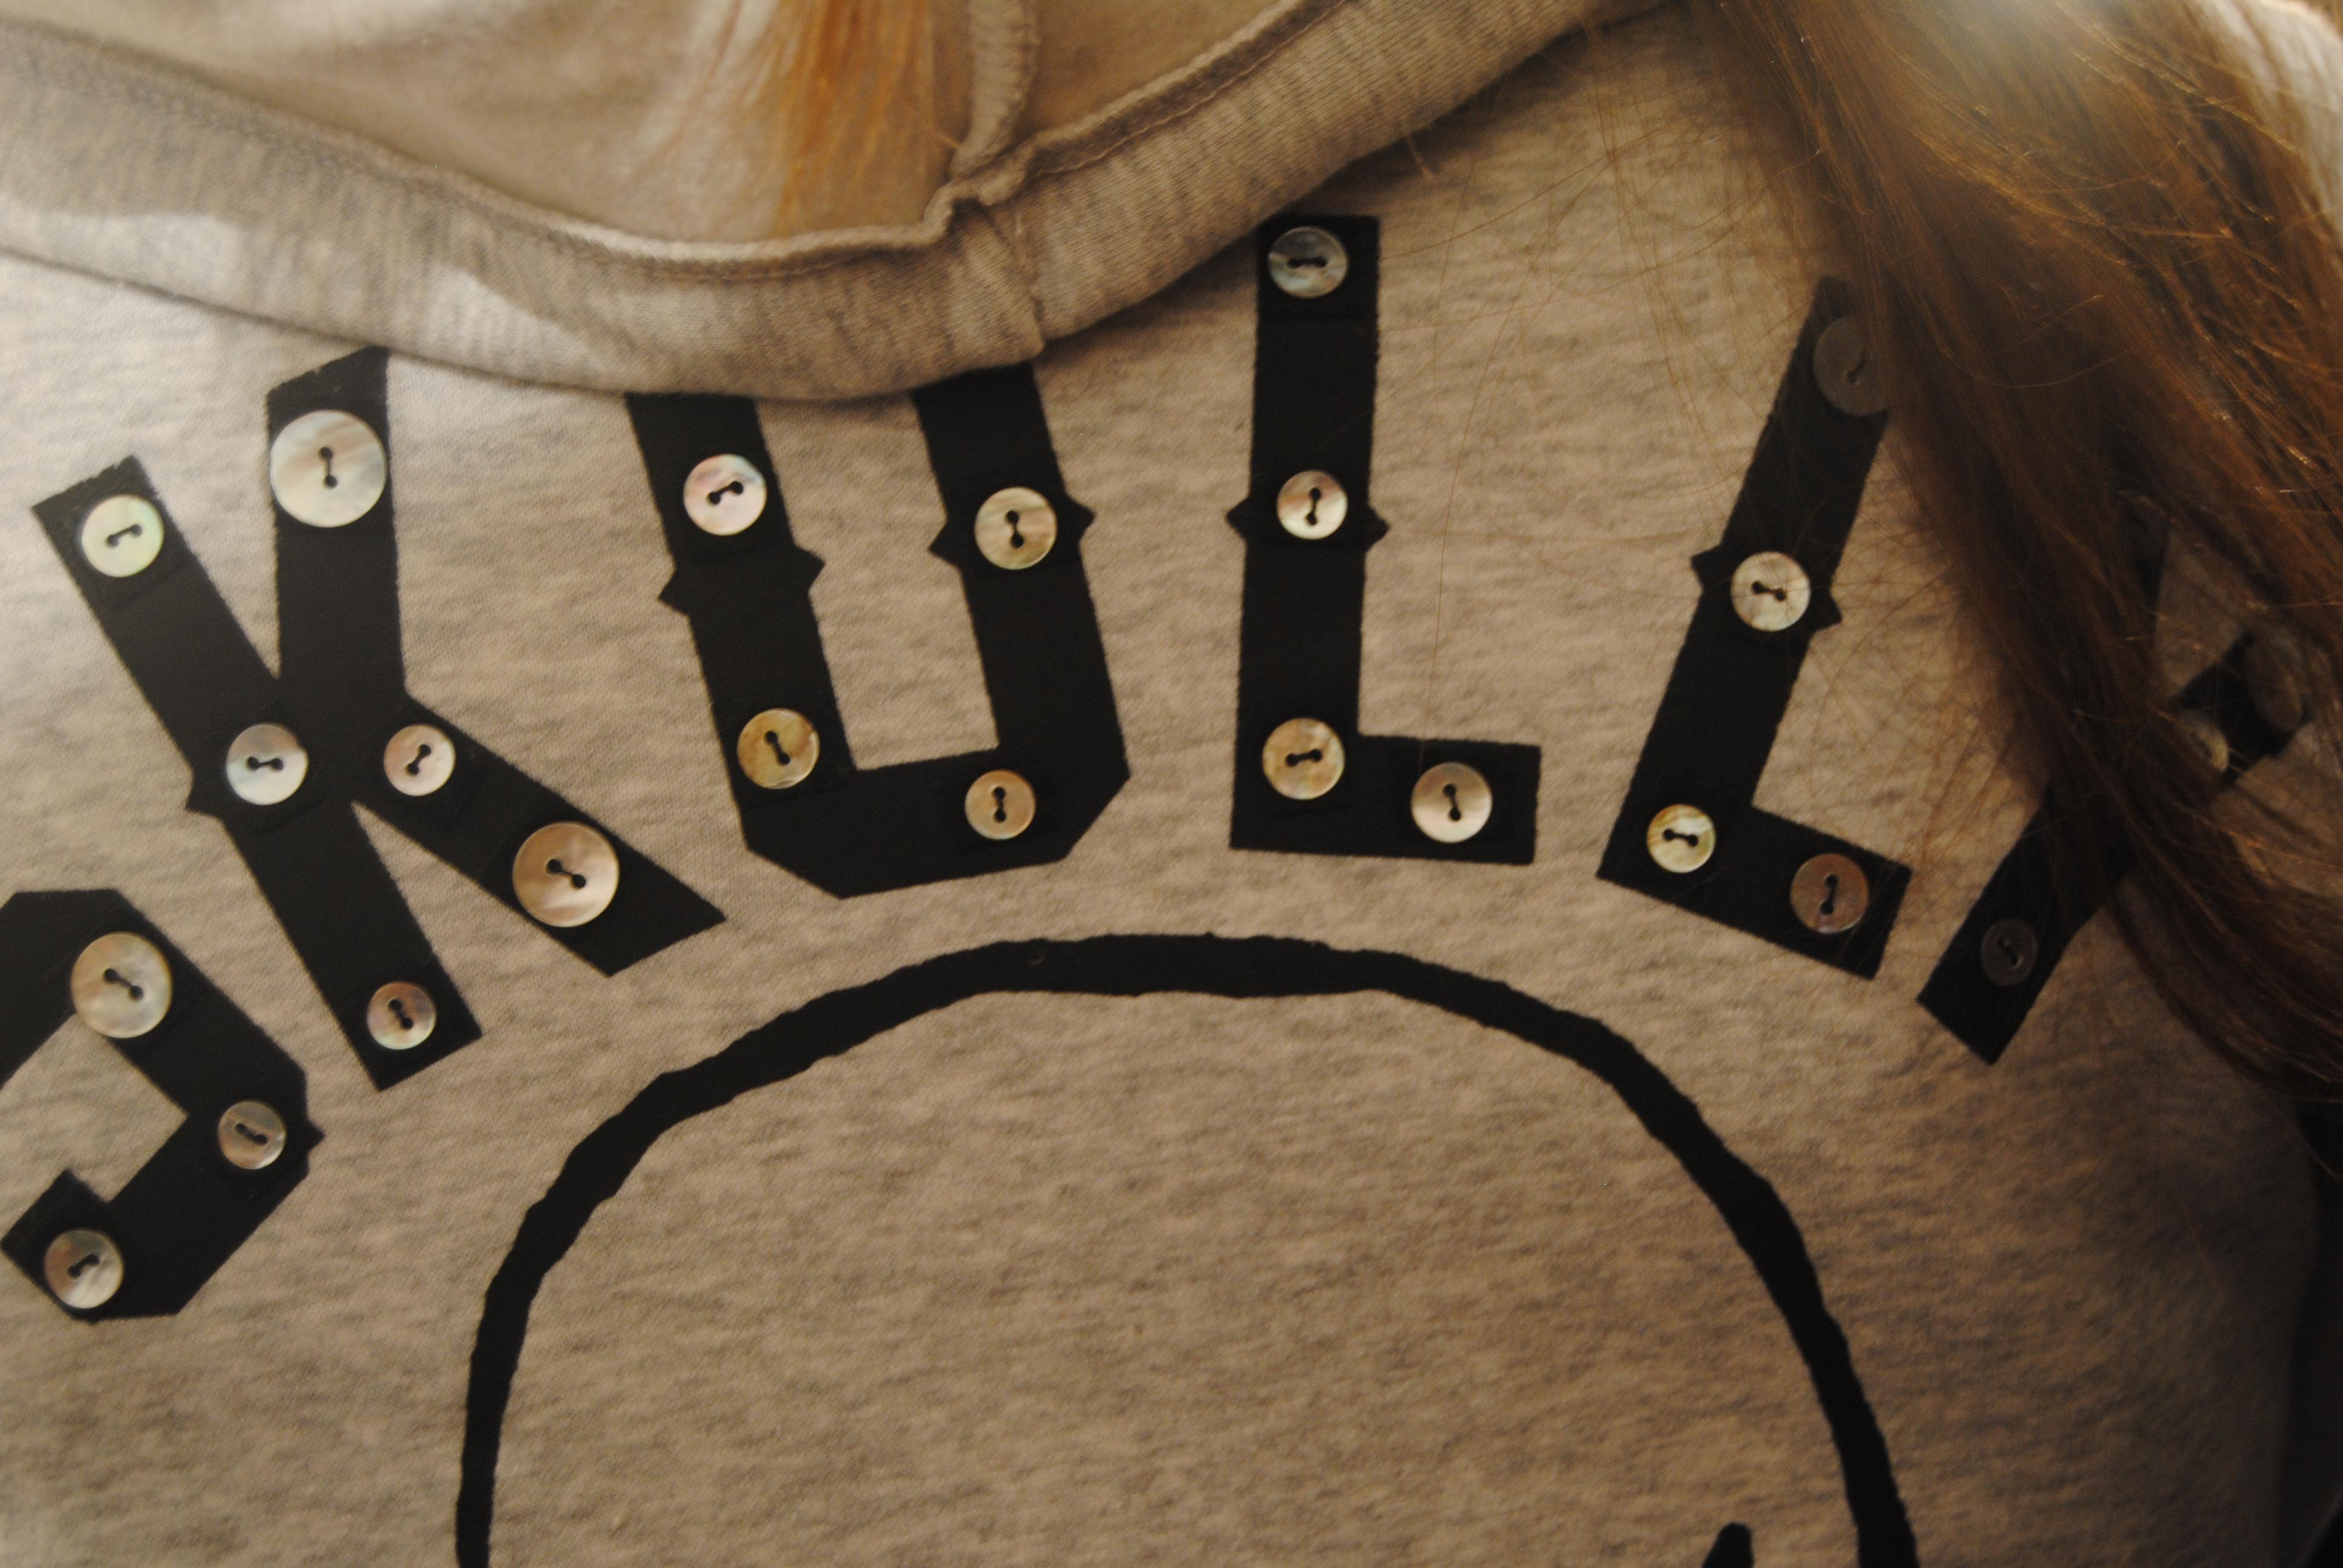 Sweater weather at NY Fashion Week (Ko Im/DC on Heels)